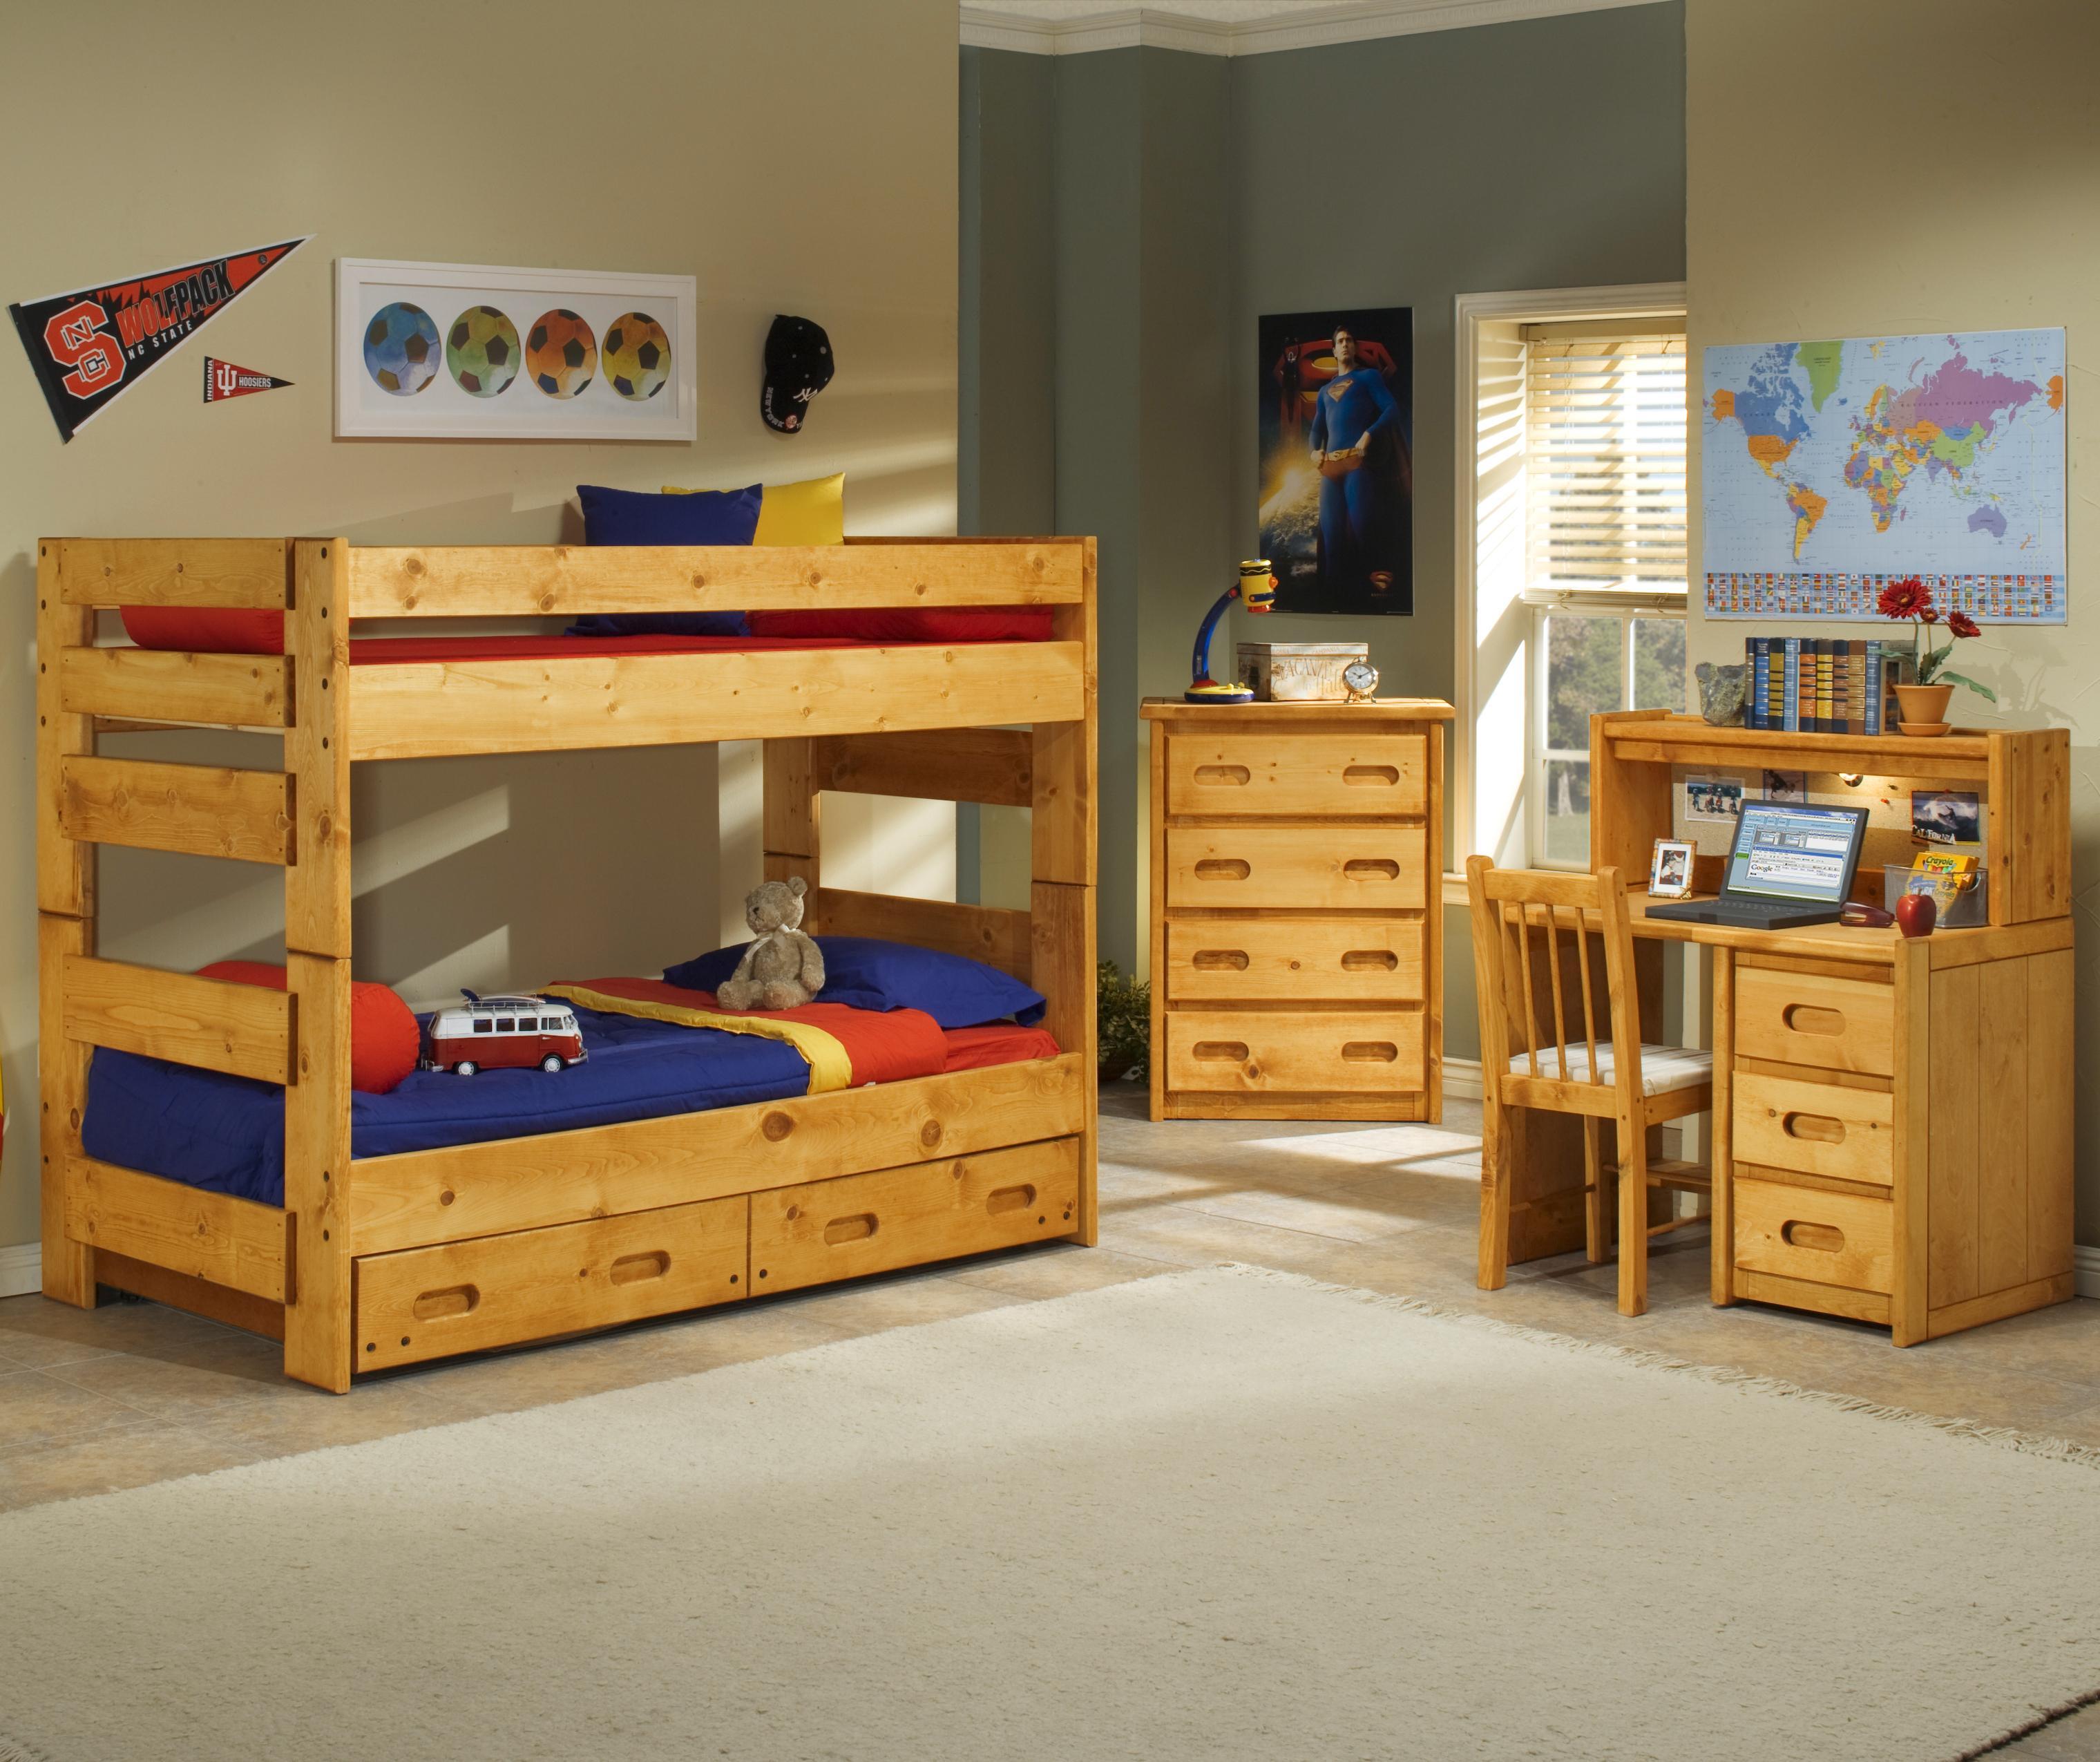 Bunkhouse 4000 By Trendwood Sam Levitz Furniture Trendwood